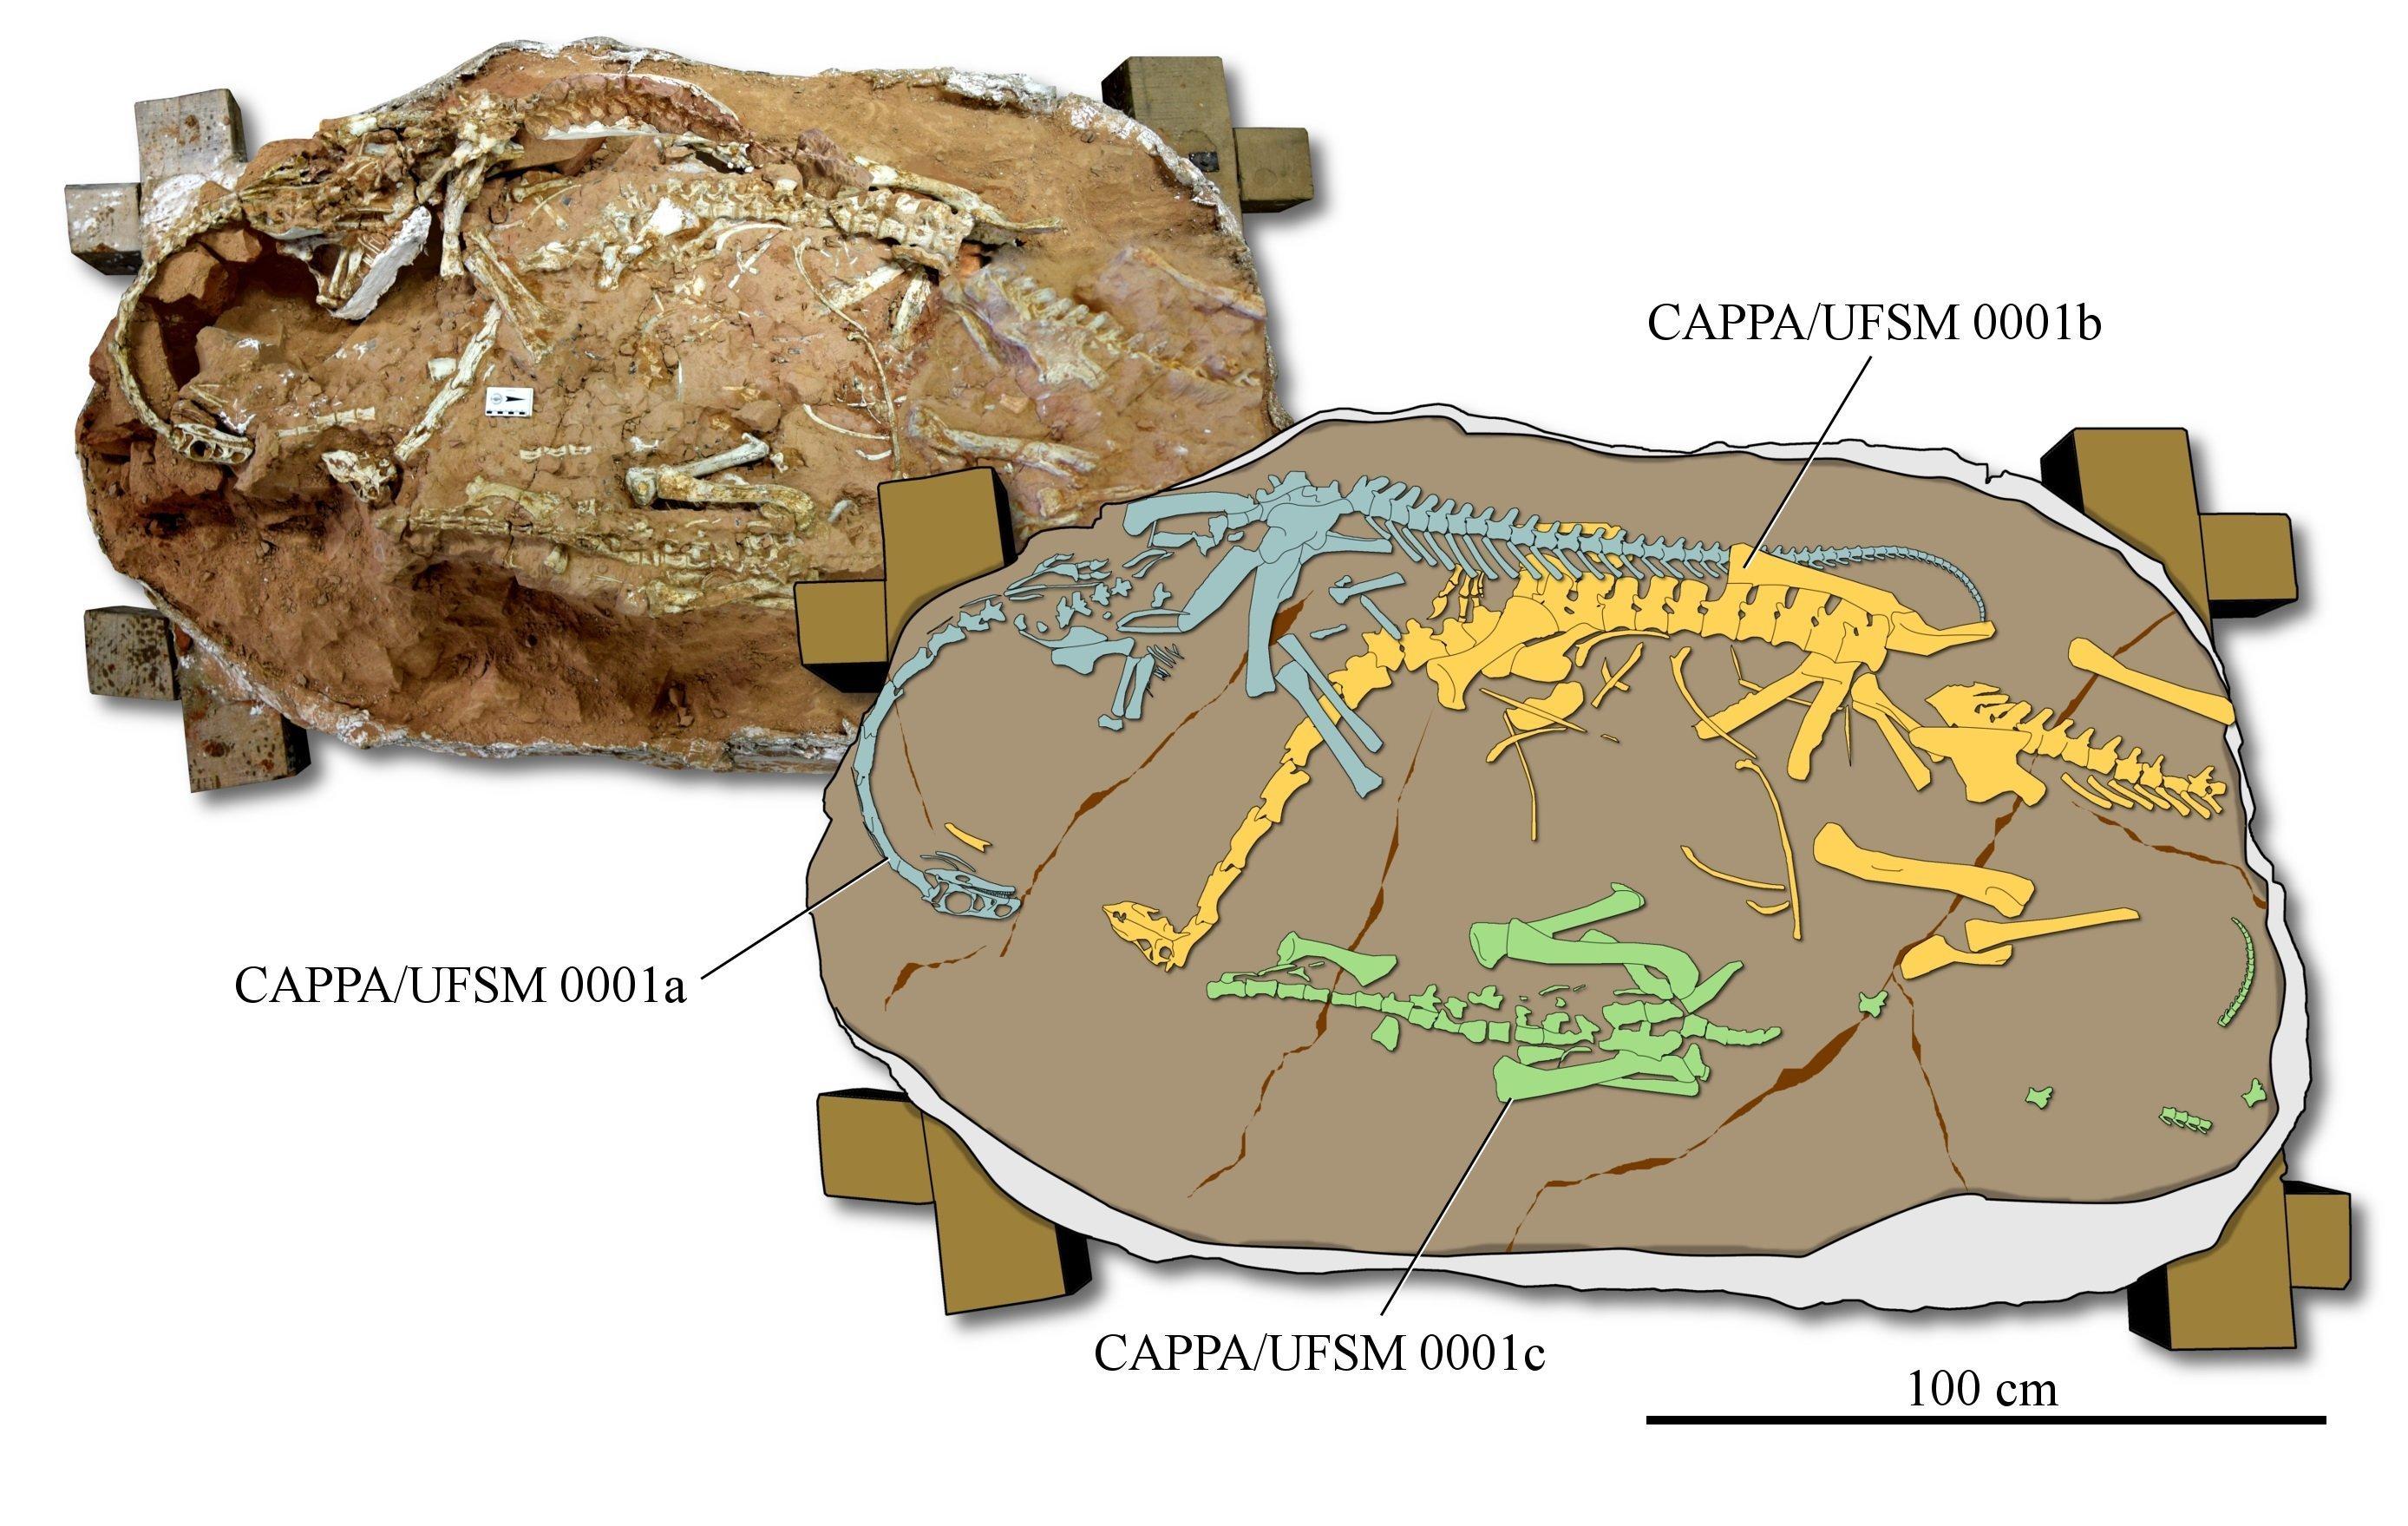 Macrocollum itaquii, ossements fossiles d'une espèce de dinosaure jusqu'alors inconnue